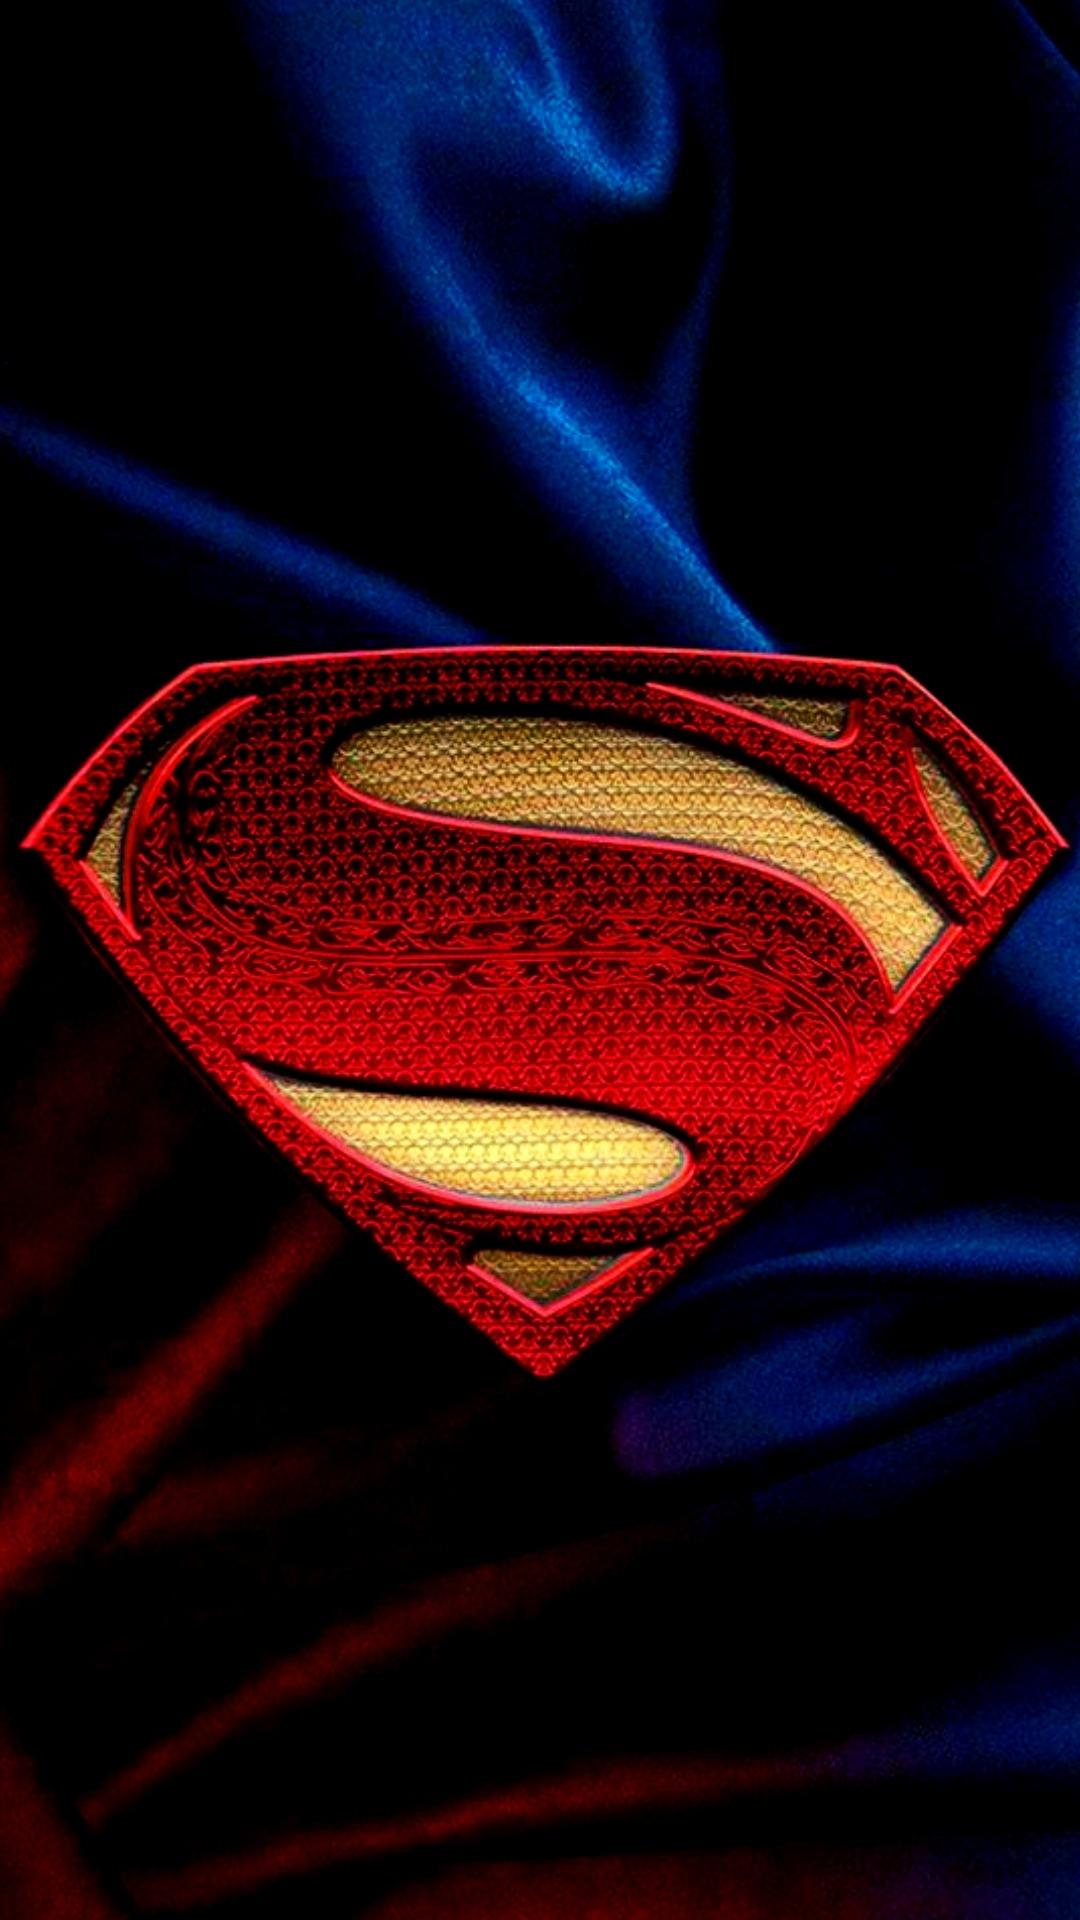 iphone wallpaper,superman,superhero,fictional character,justice league,space